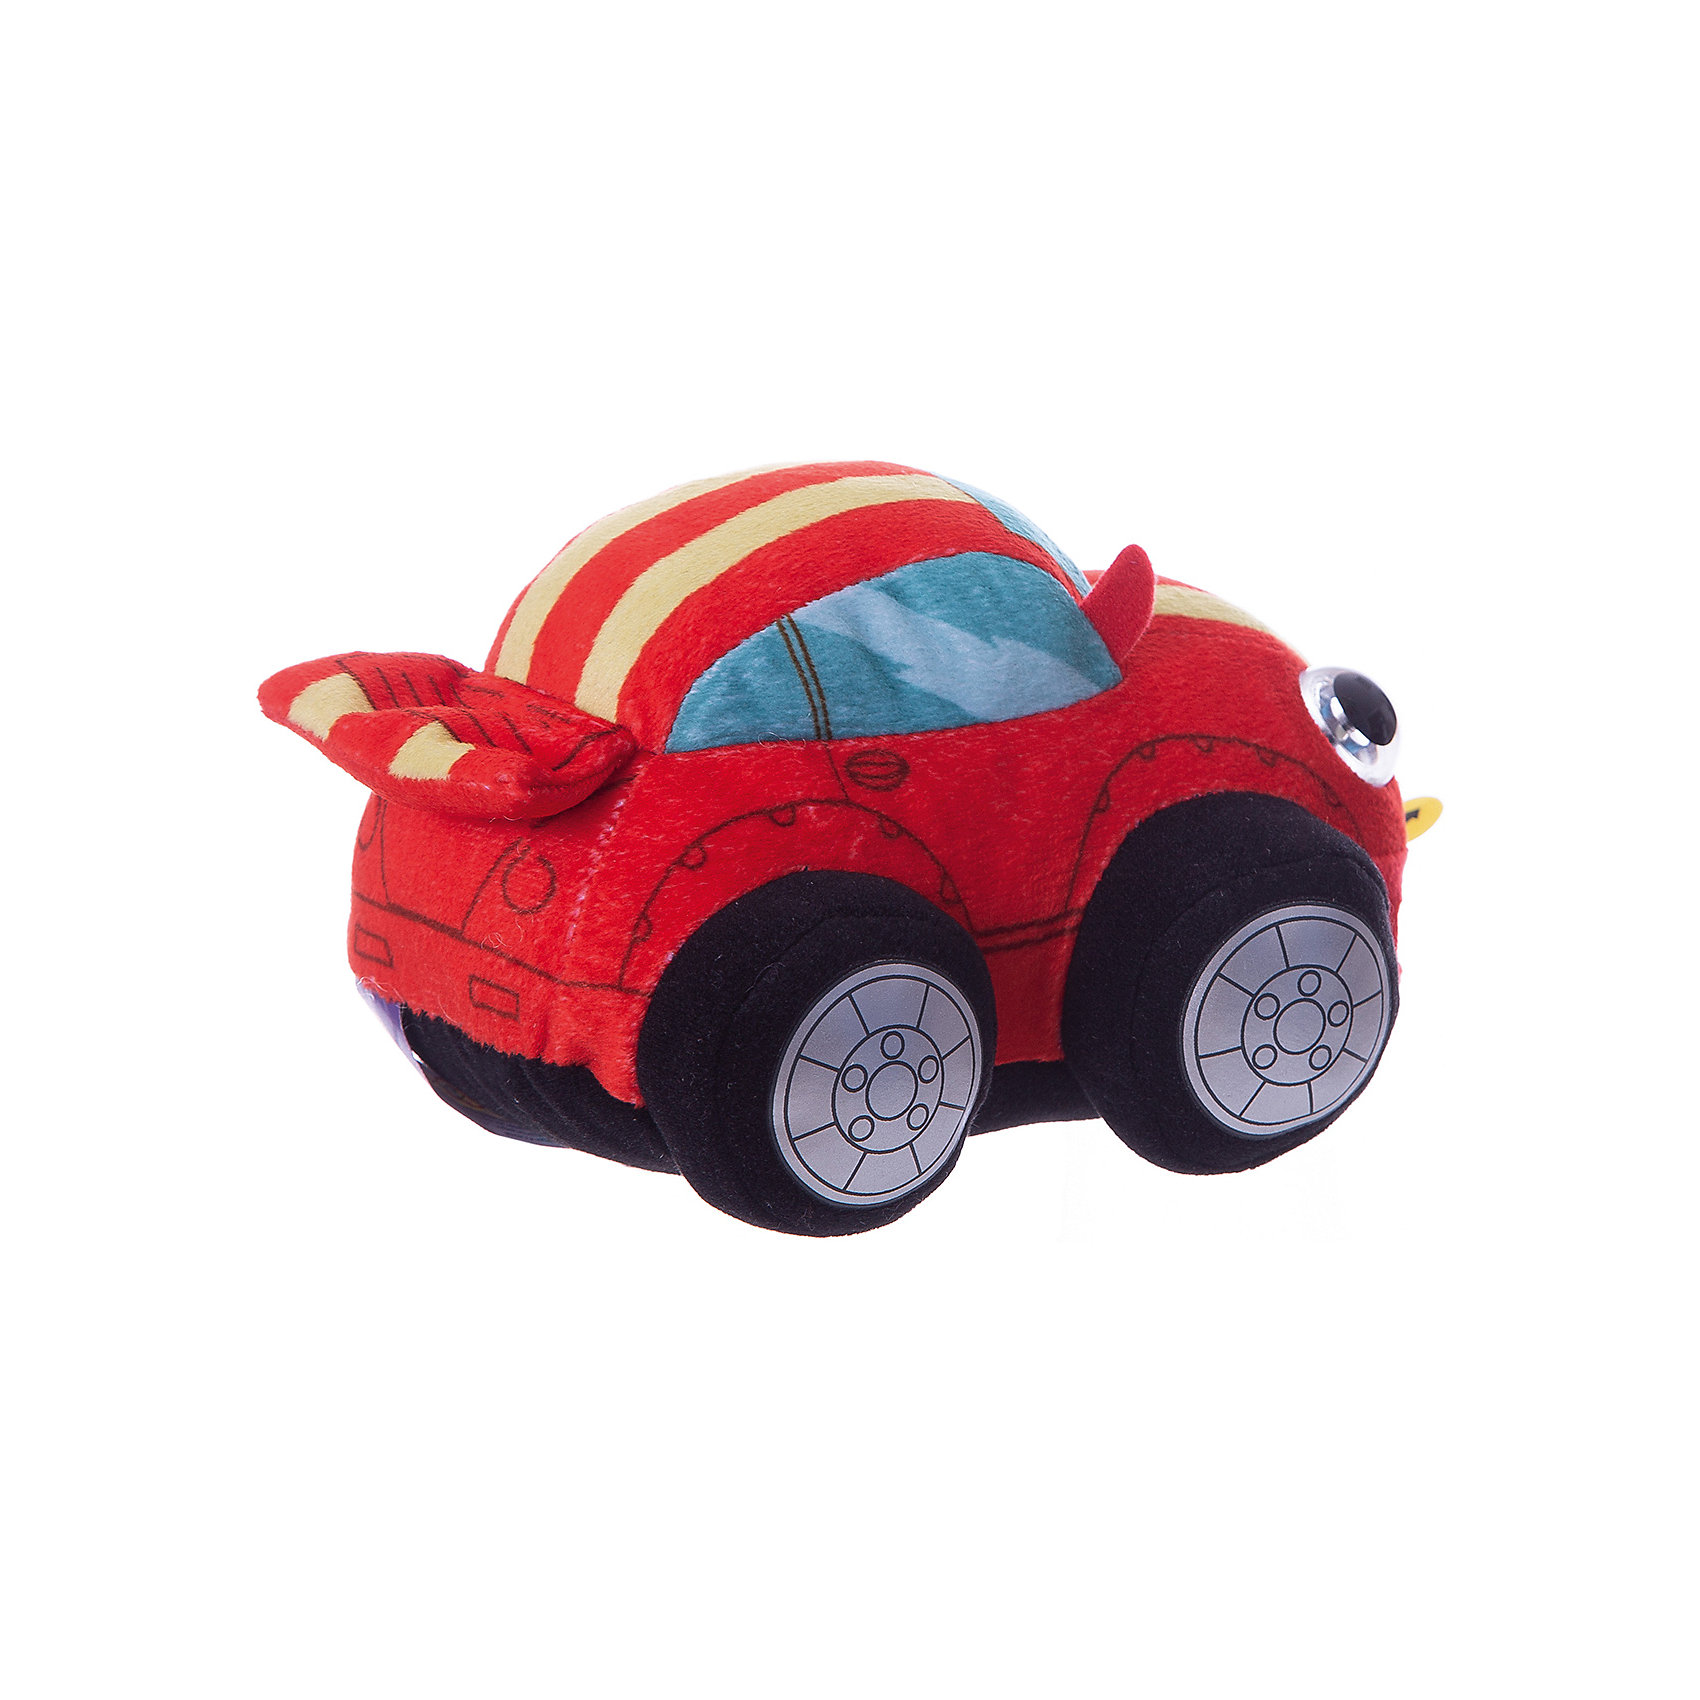 "Мягкая игрушка 1toy ""Дразнюка-Биби"" Машинка, 15 см, свет, звук"